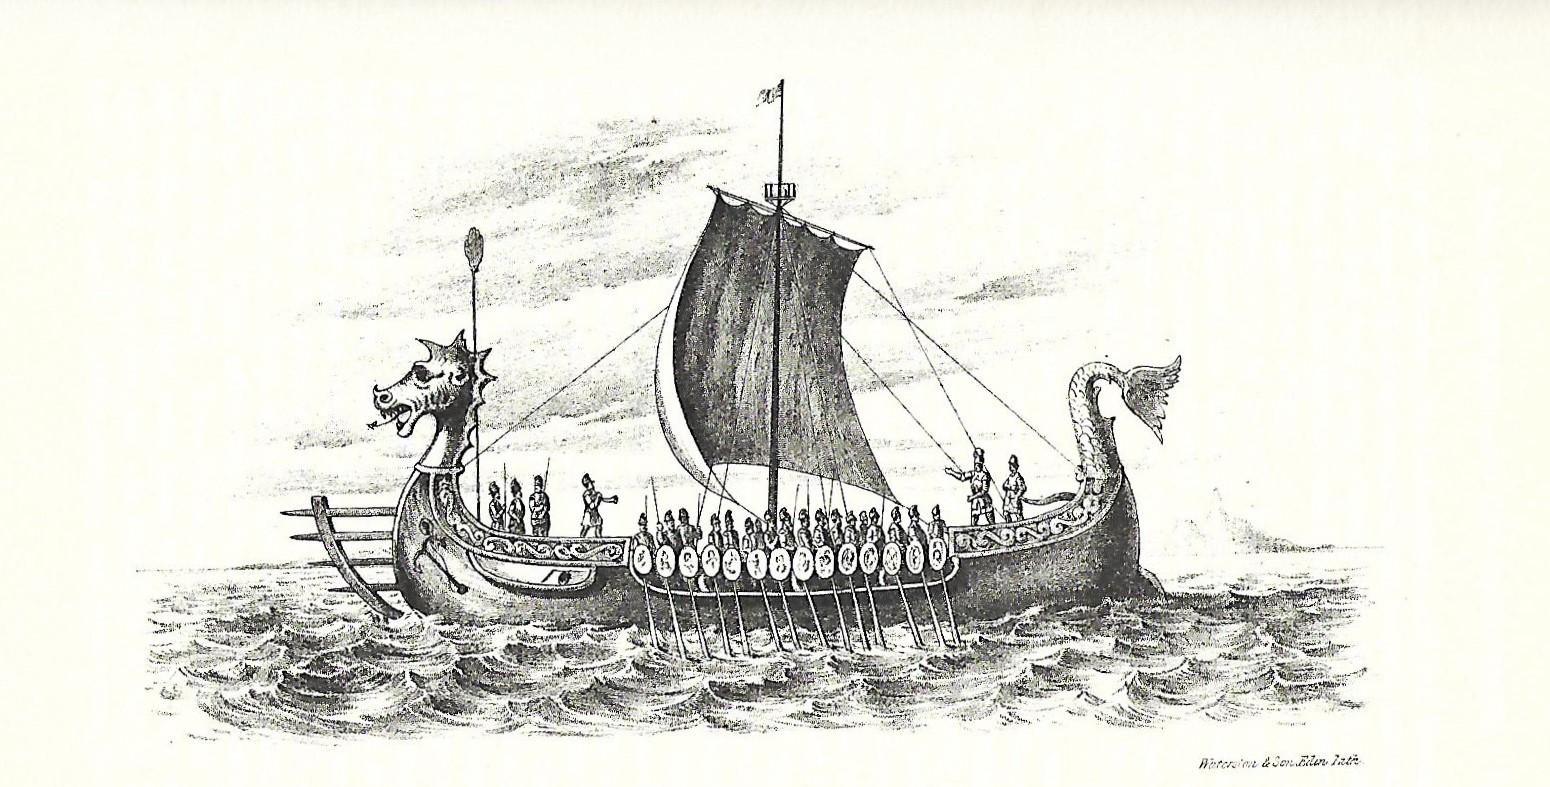 Victorian era illustration of a Viking longship